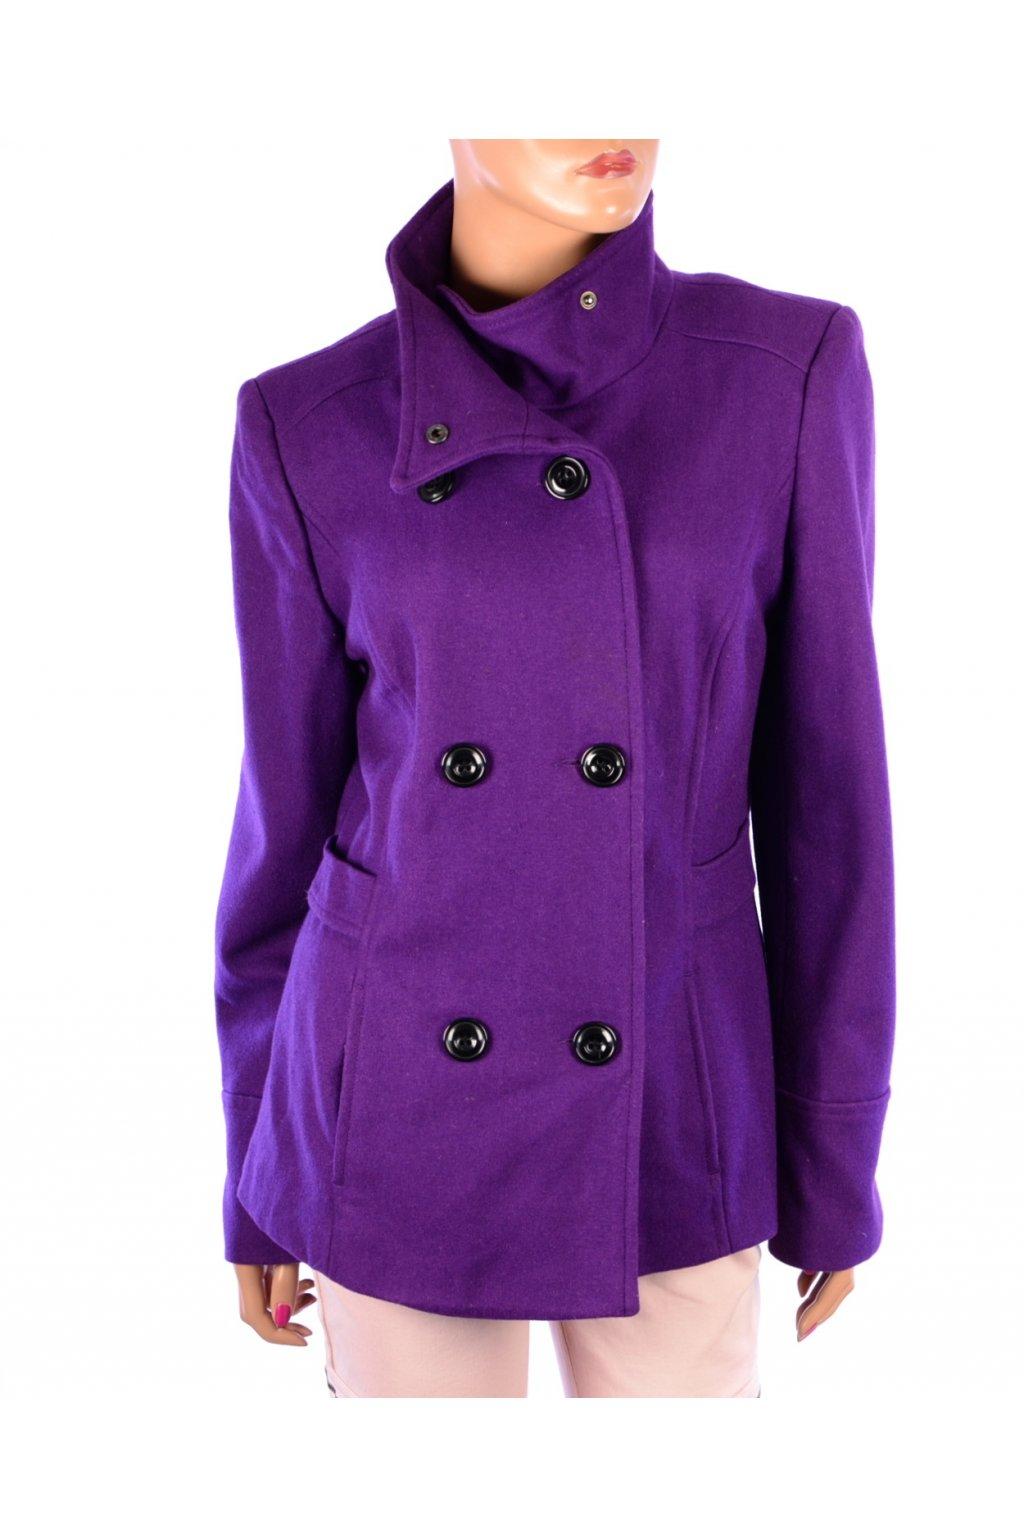 Kabát George podzim zima fialový 60% vlna vel. 42 / uk 12 / M